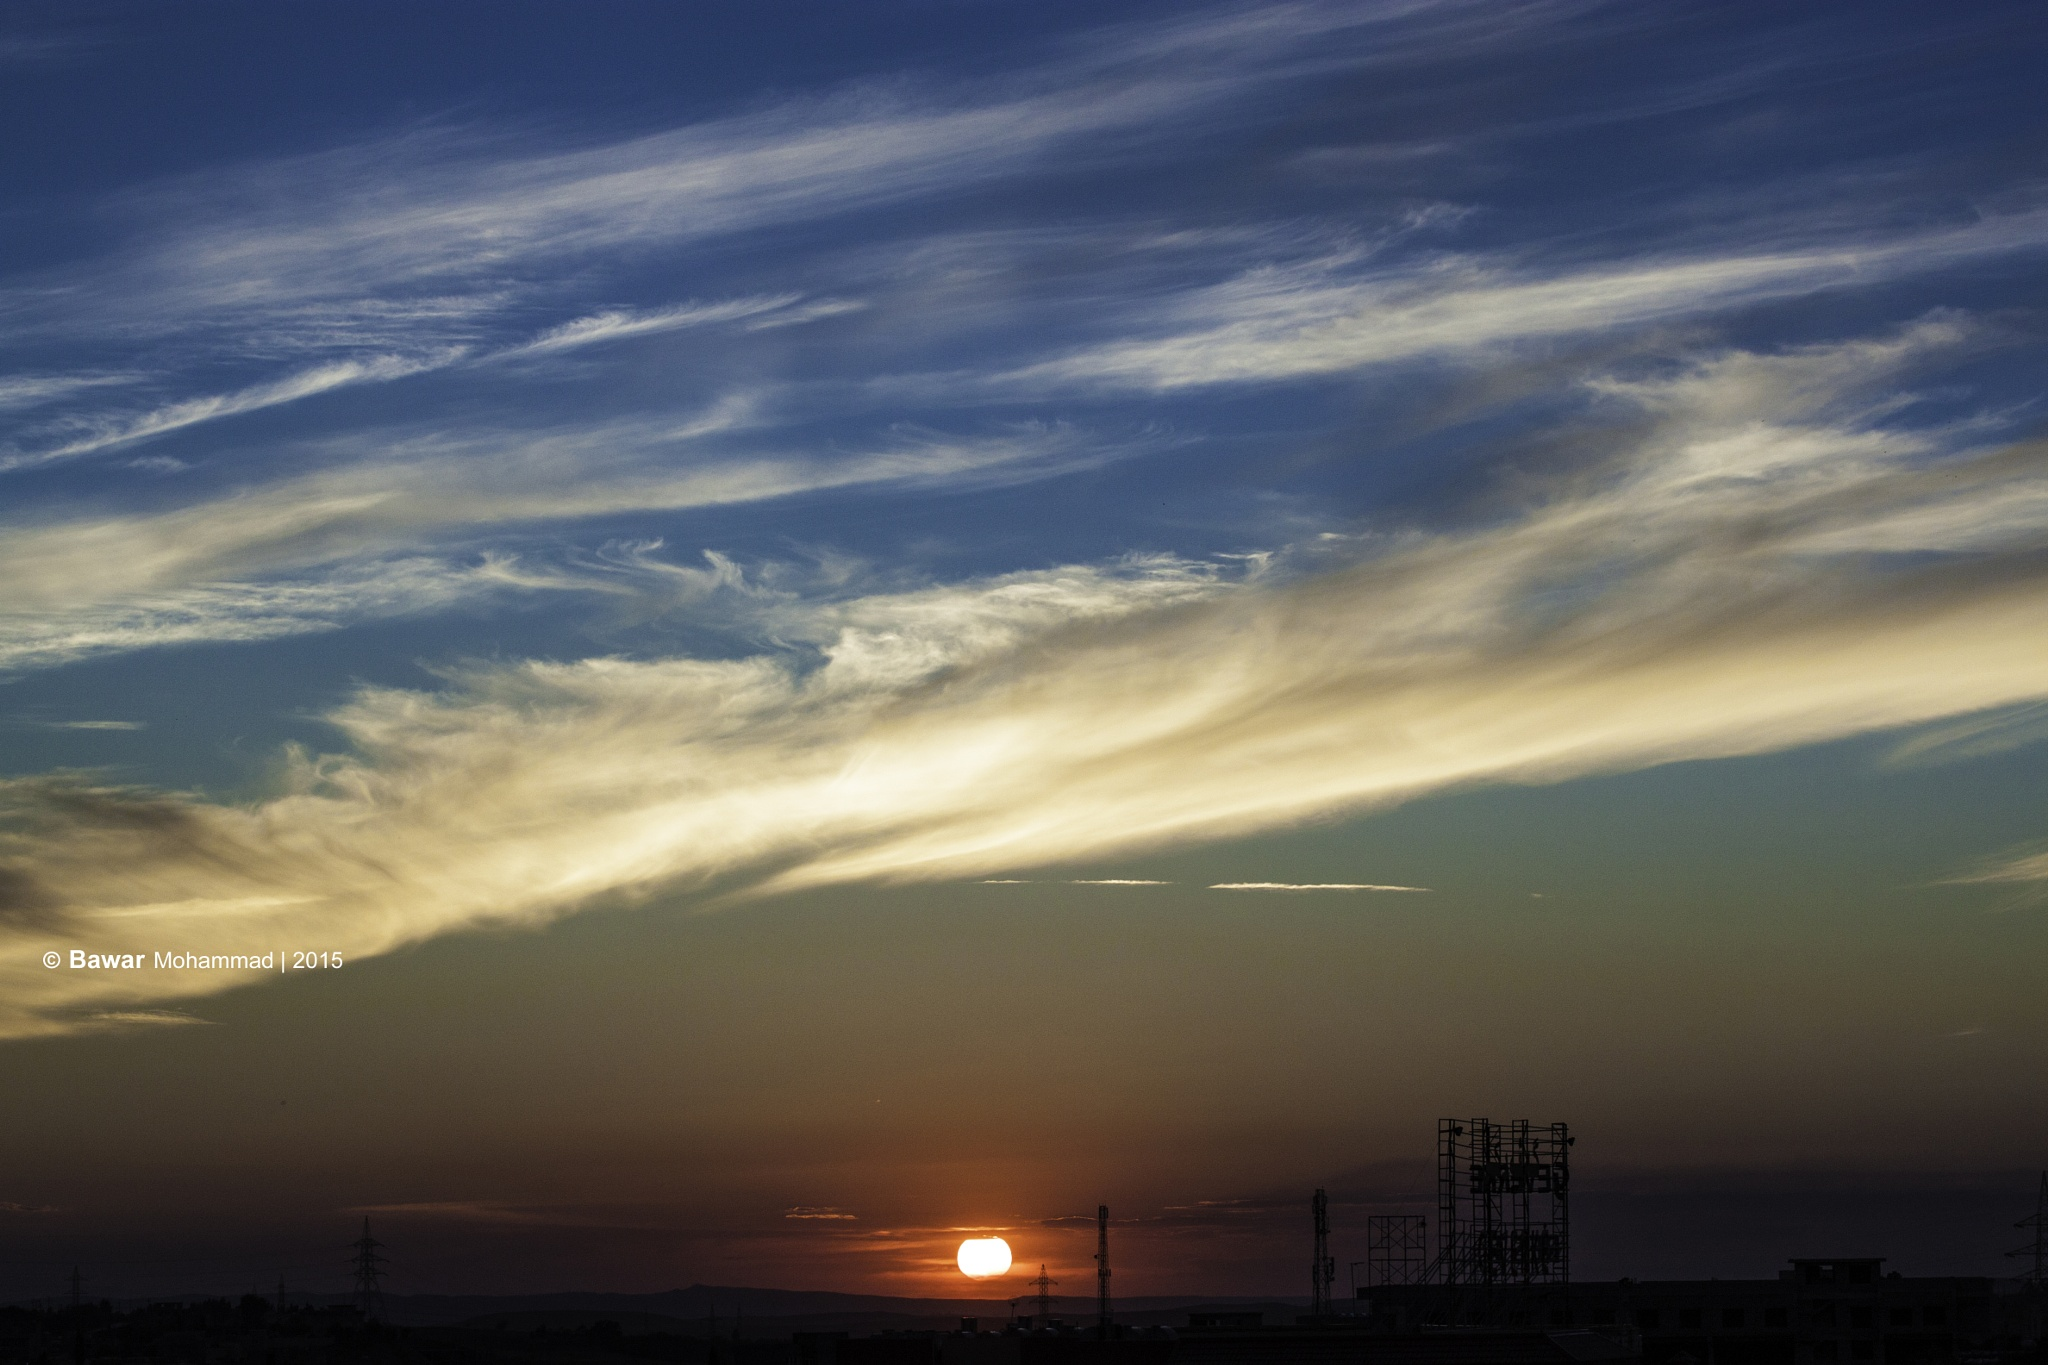 Sunset autumn by BawarMohammadSidiq